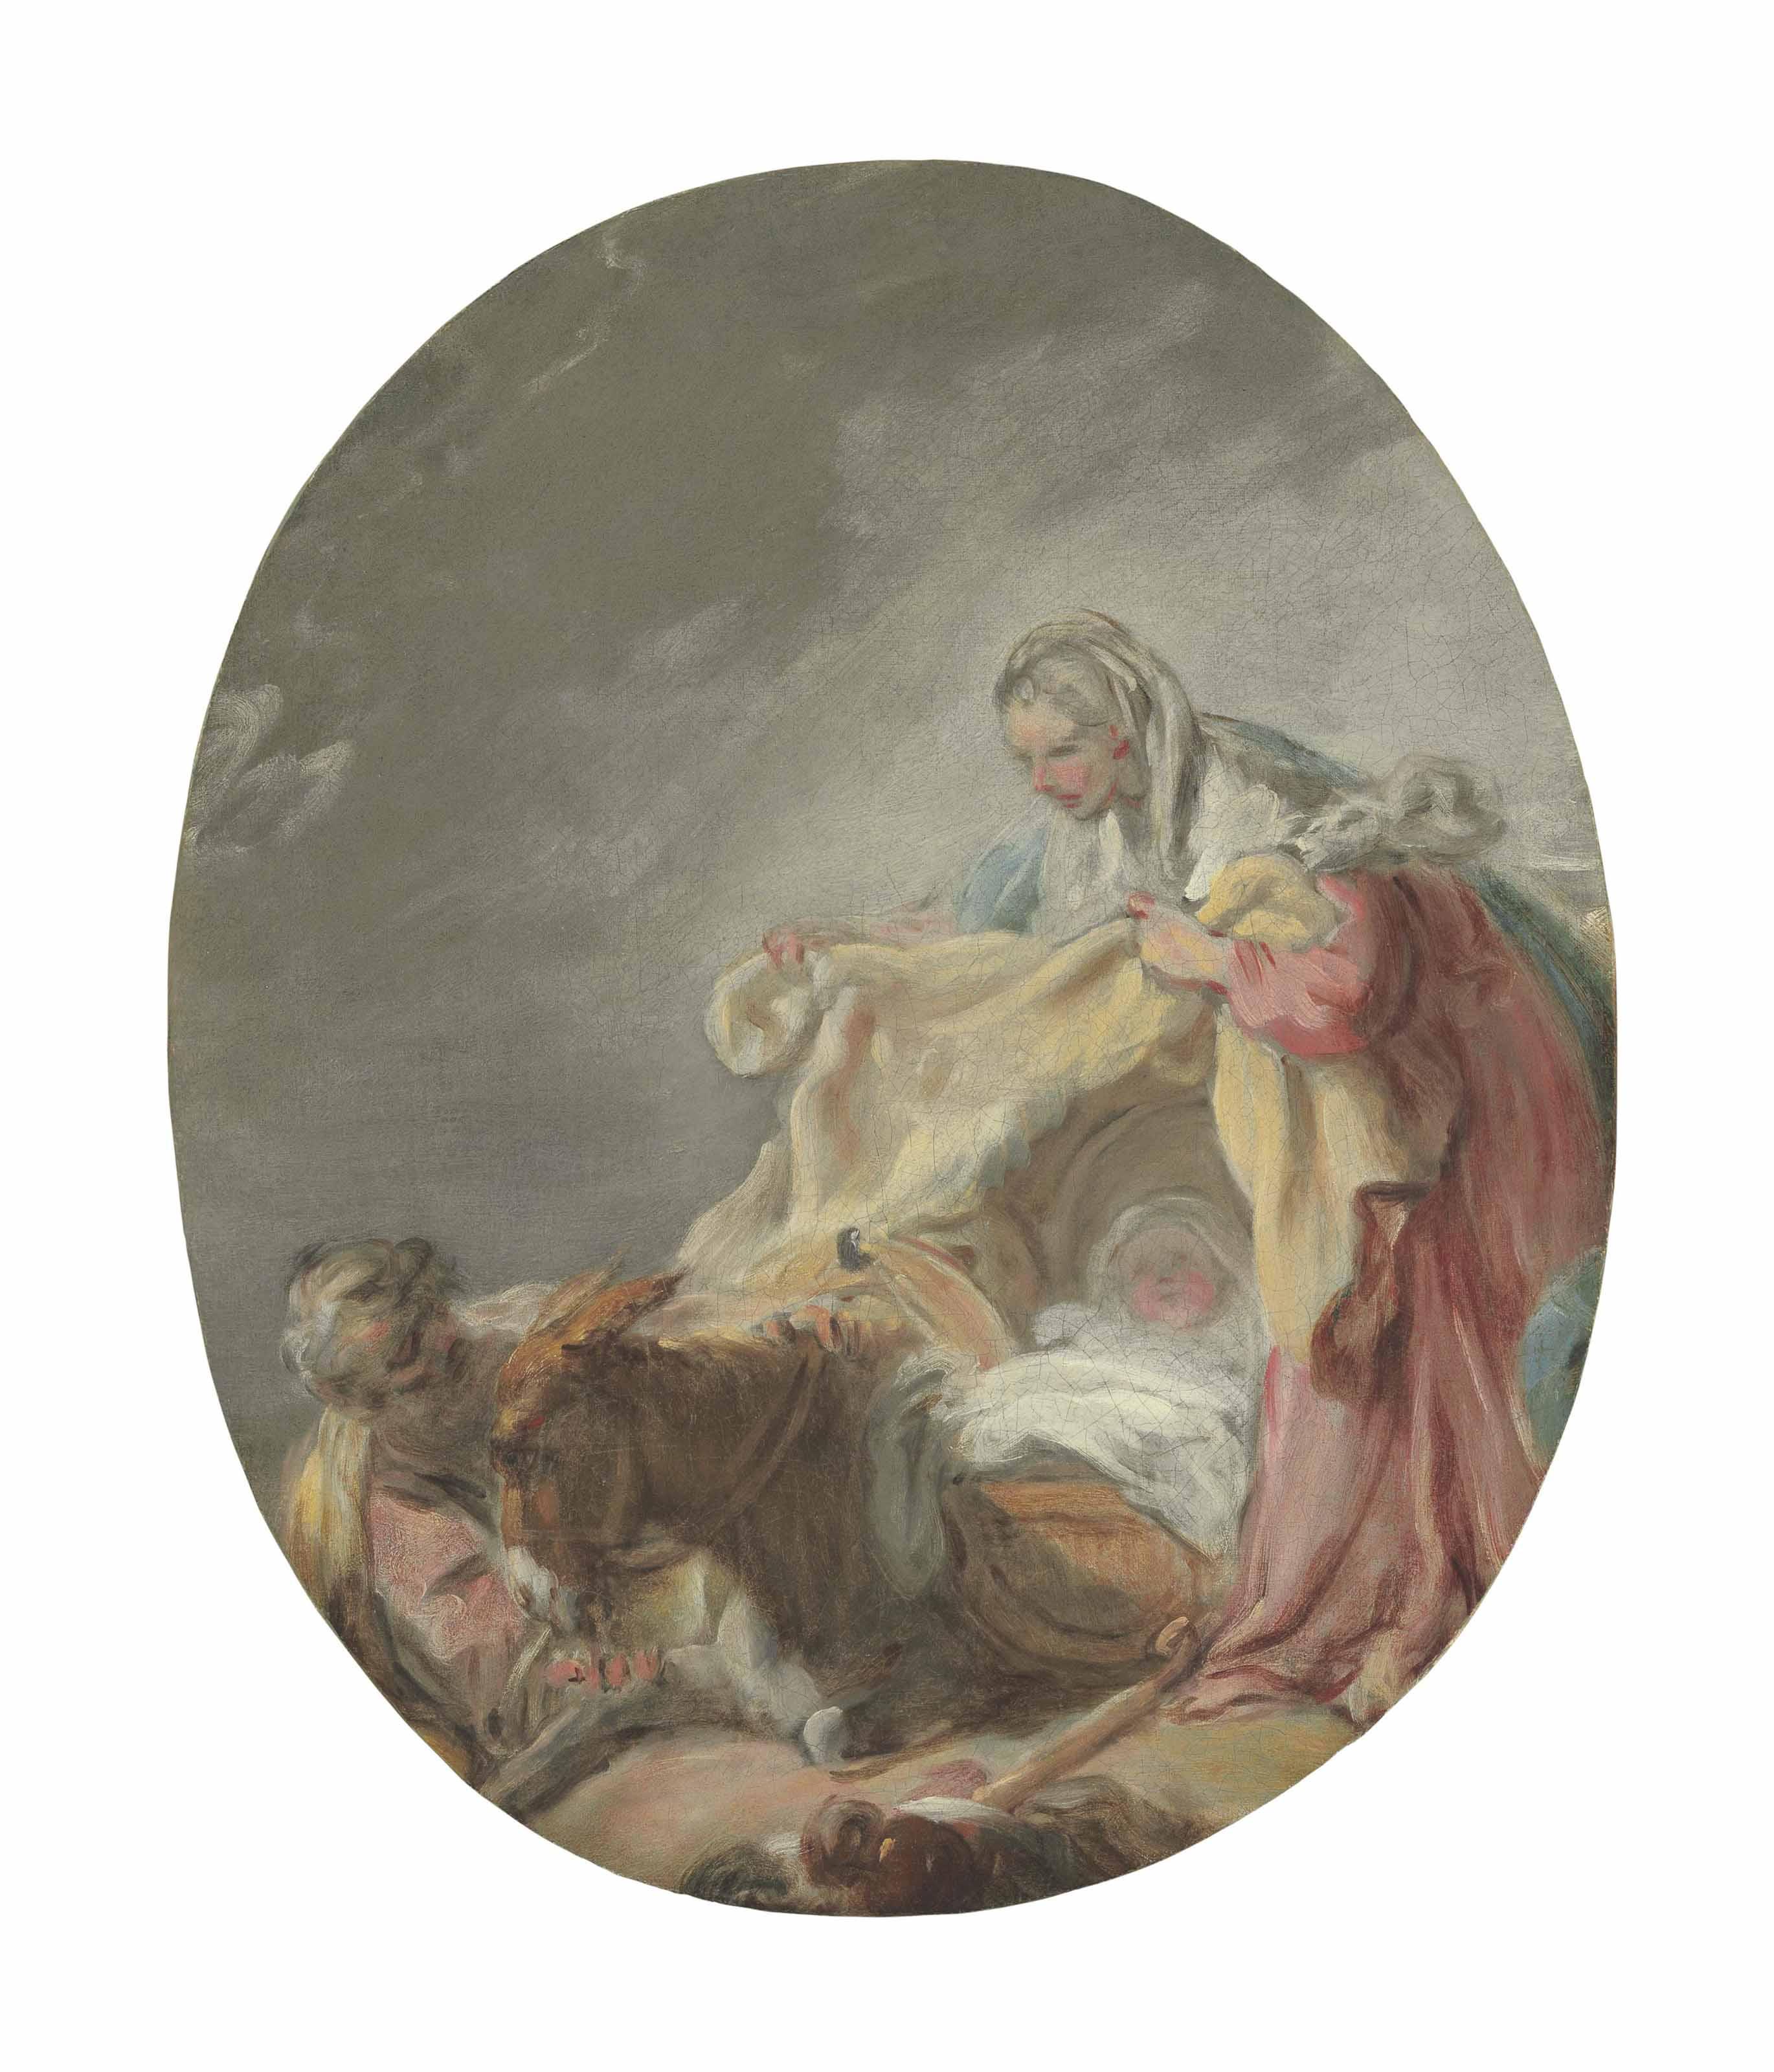 Jean-Honoré Fragonard (Grasse